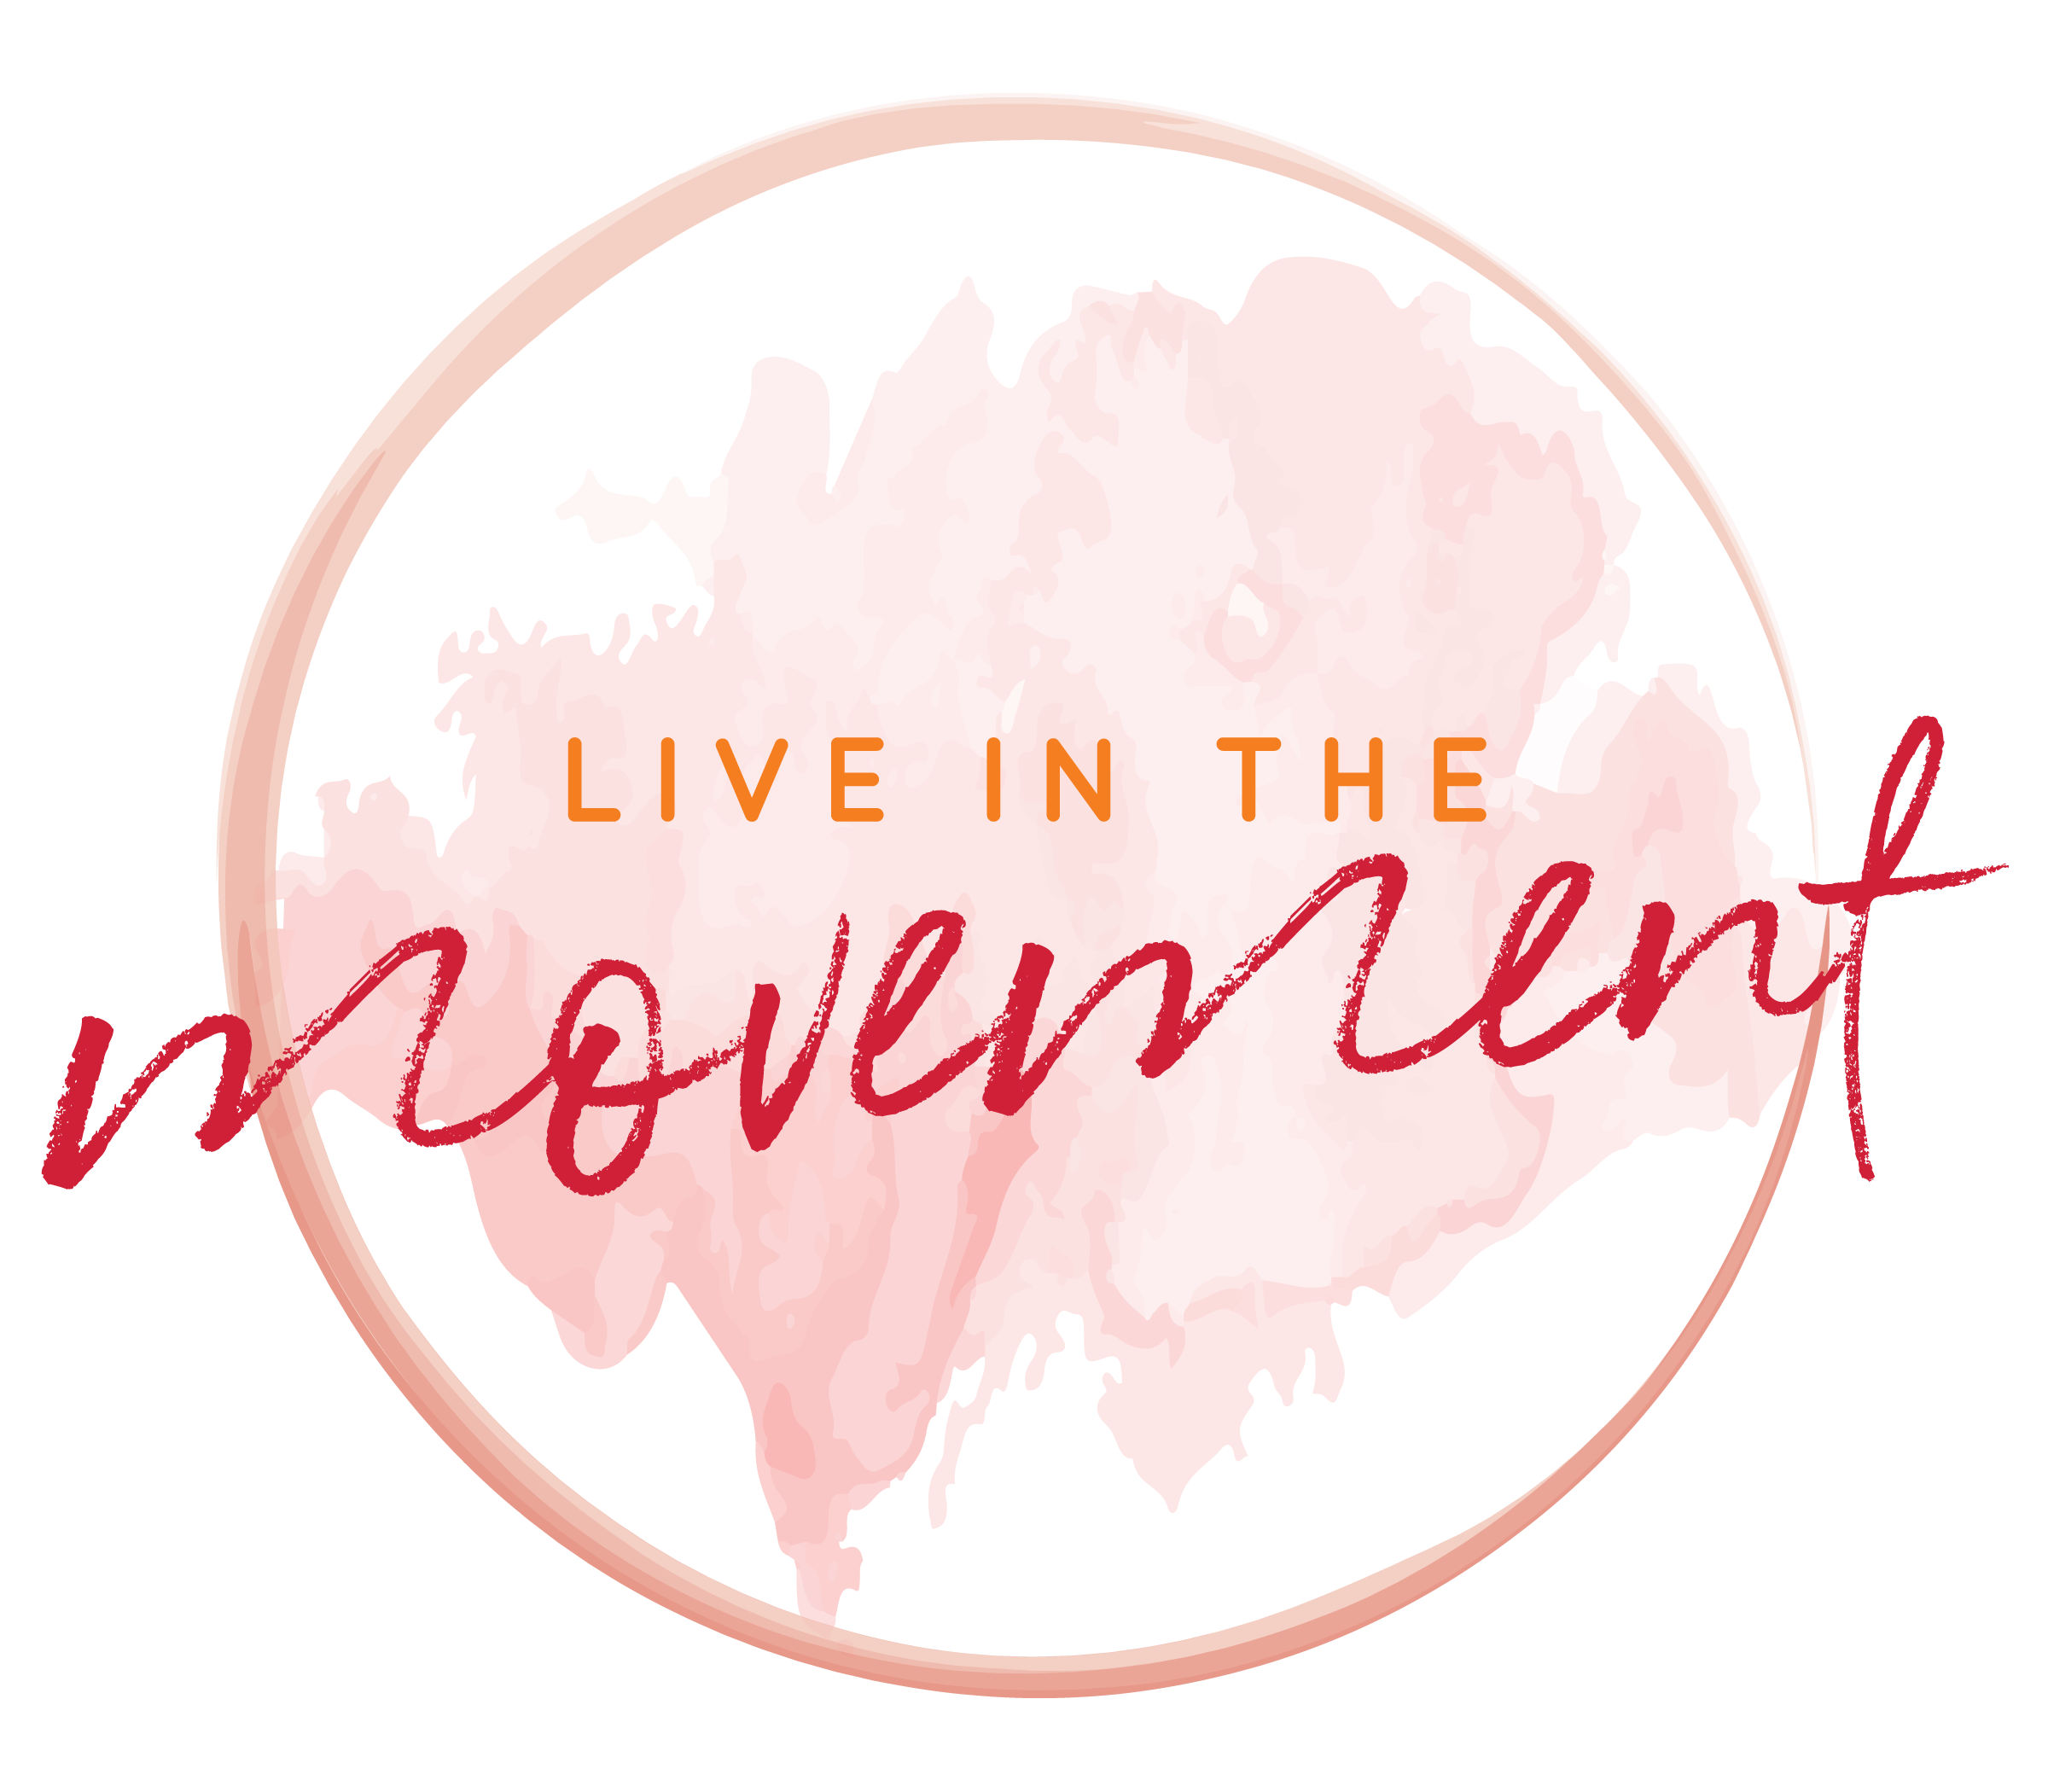 LiveInTheMovement_logo_FINAL.png